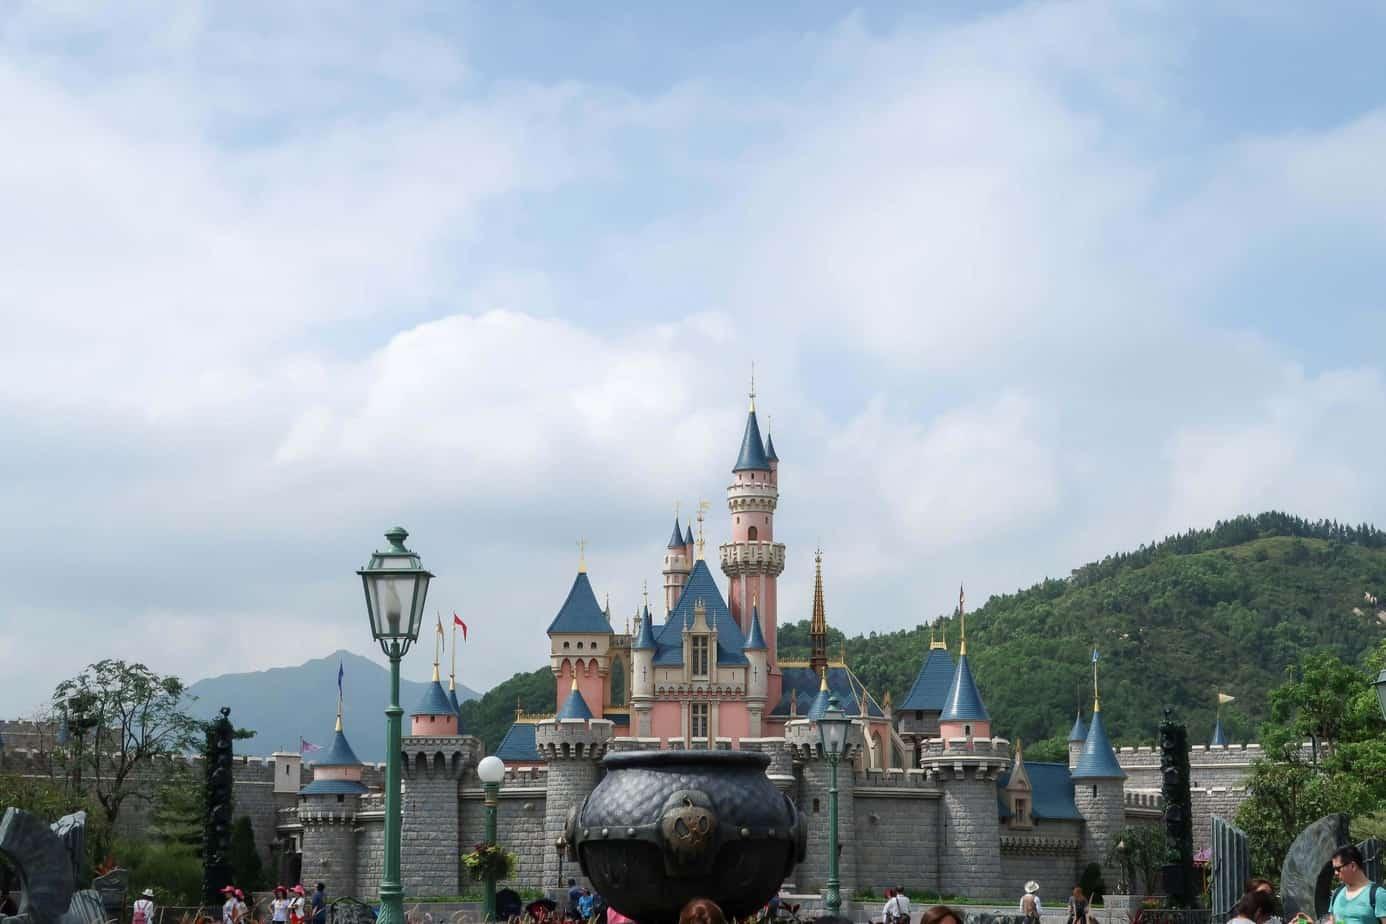 Hong Kong Disneyland Ultimate Trip Planning Guide 2019 Tiket Hongkong Open Date Resort Consists Of One Park And Three Disney Hotels Hotel Disneys Hollywood Their Newest